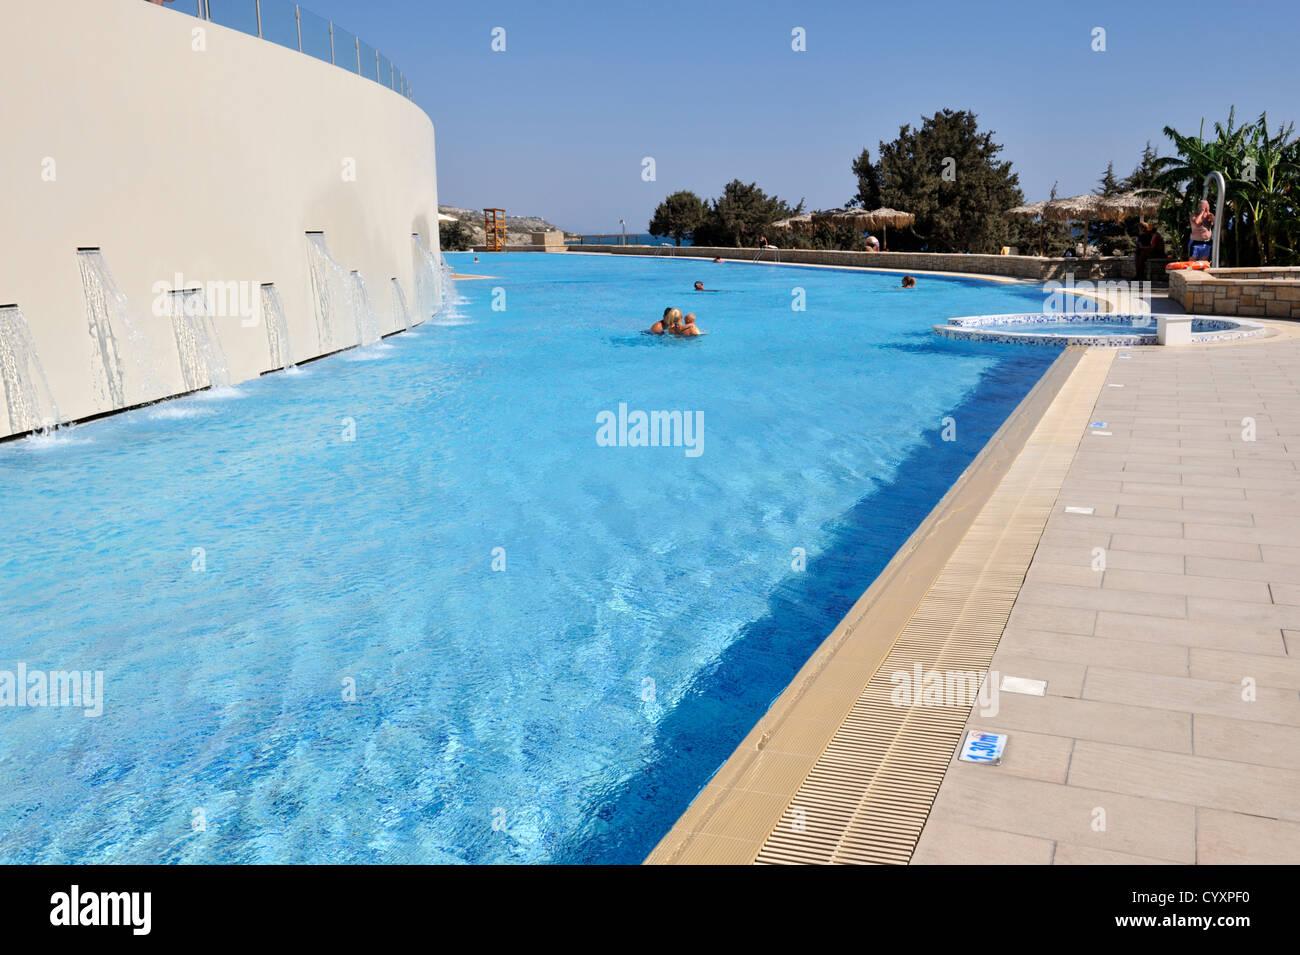 Blue Lagoon Village Resort One Of Many Swimming Pools Kos Greece Stock Photo Royalty Free